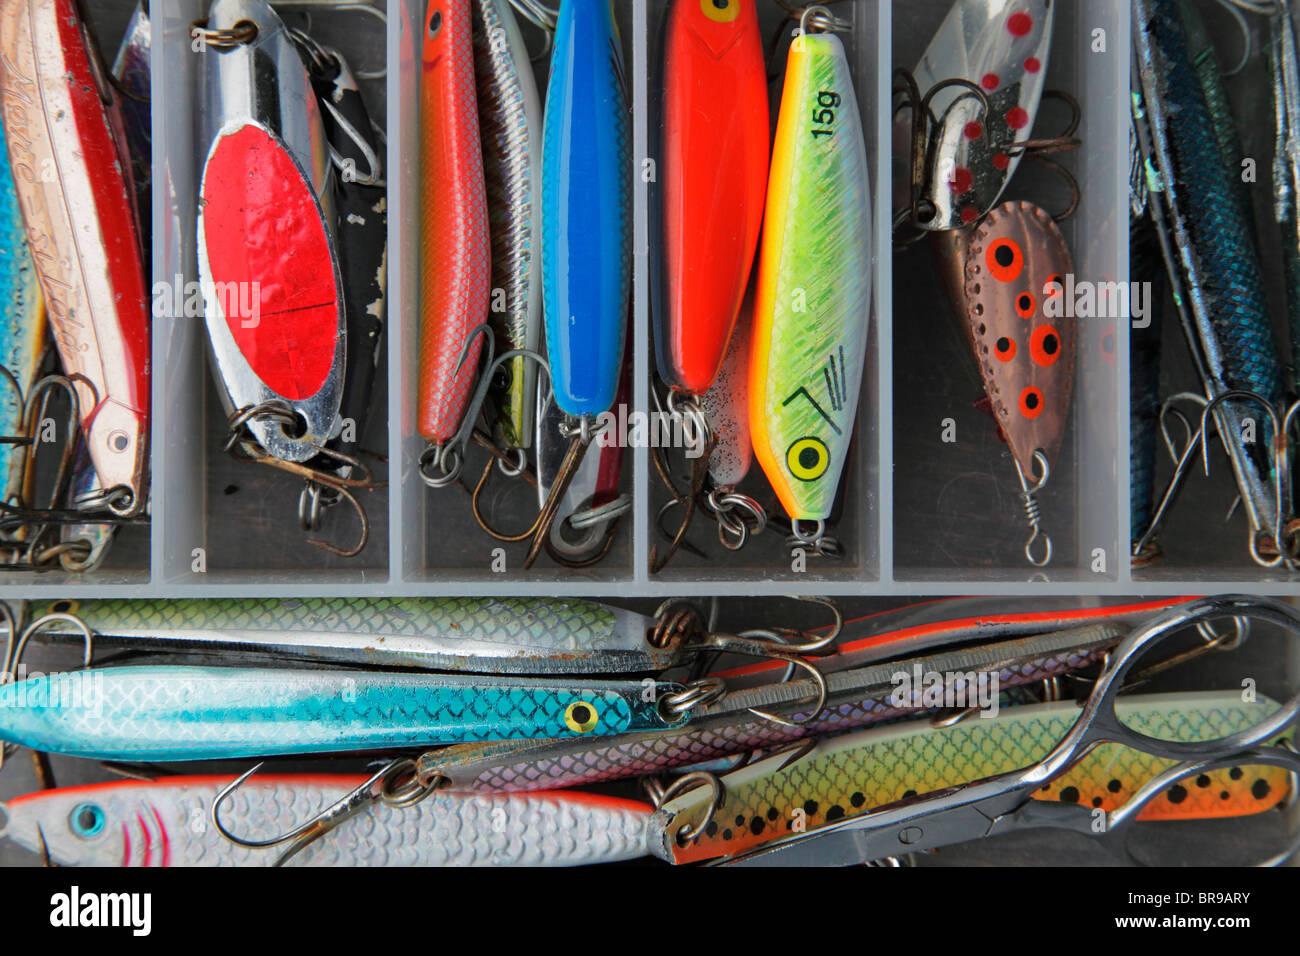 fish bait box - Stock Image